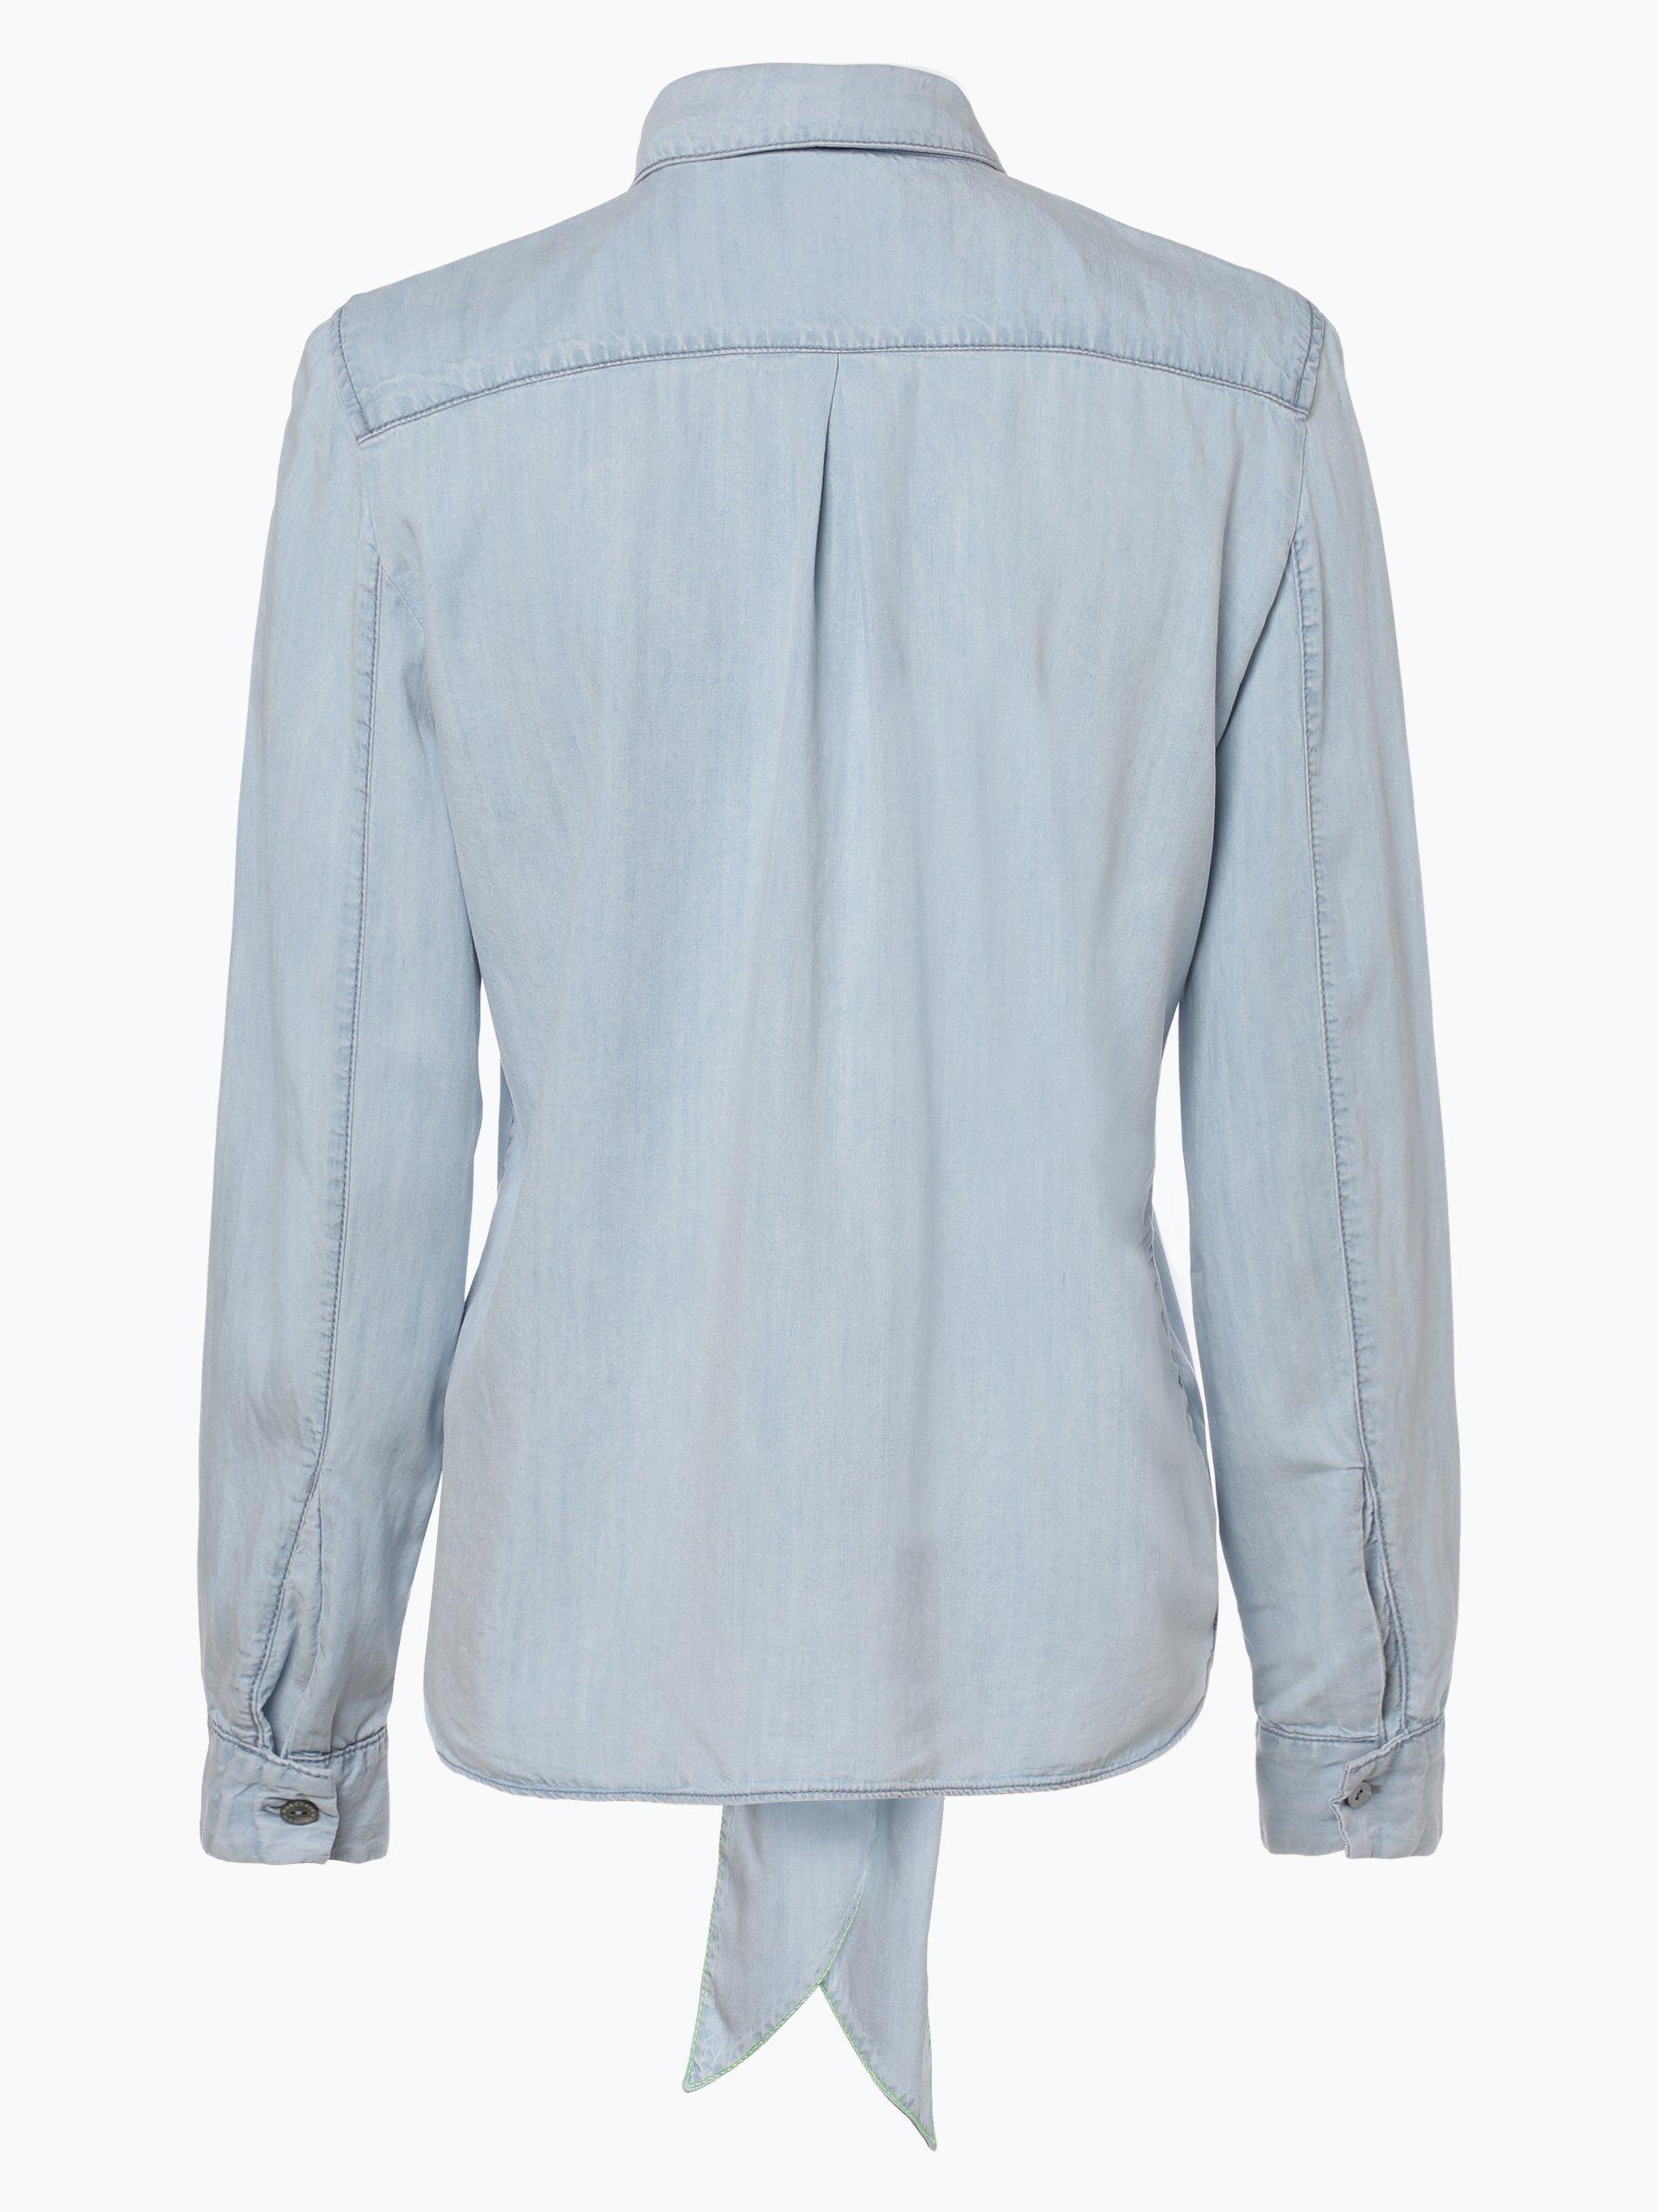 Marc Cain Collections Damska koszula jeansowa